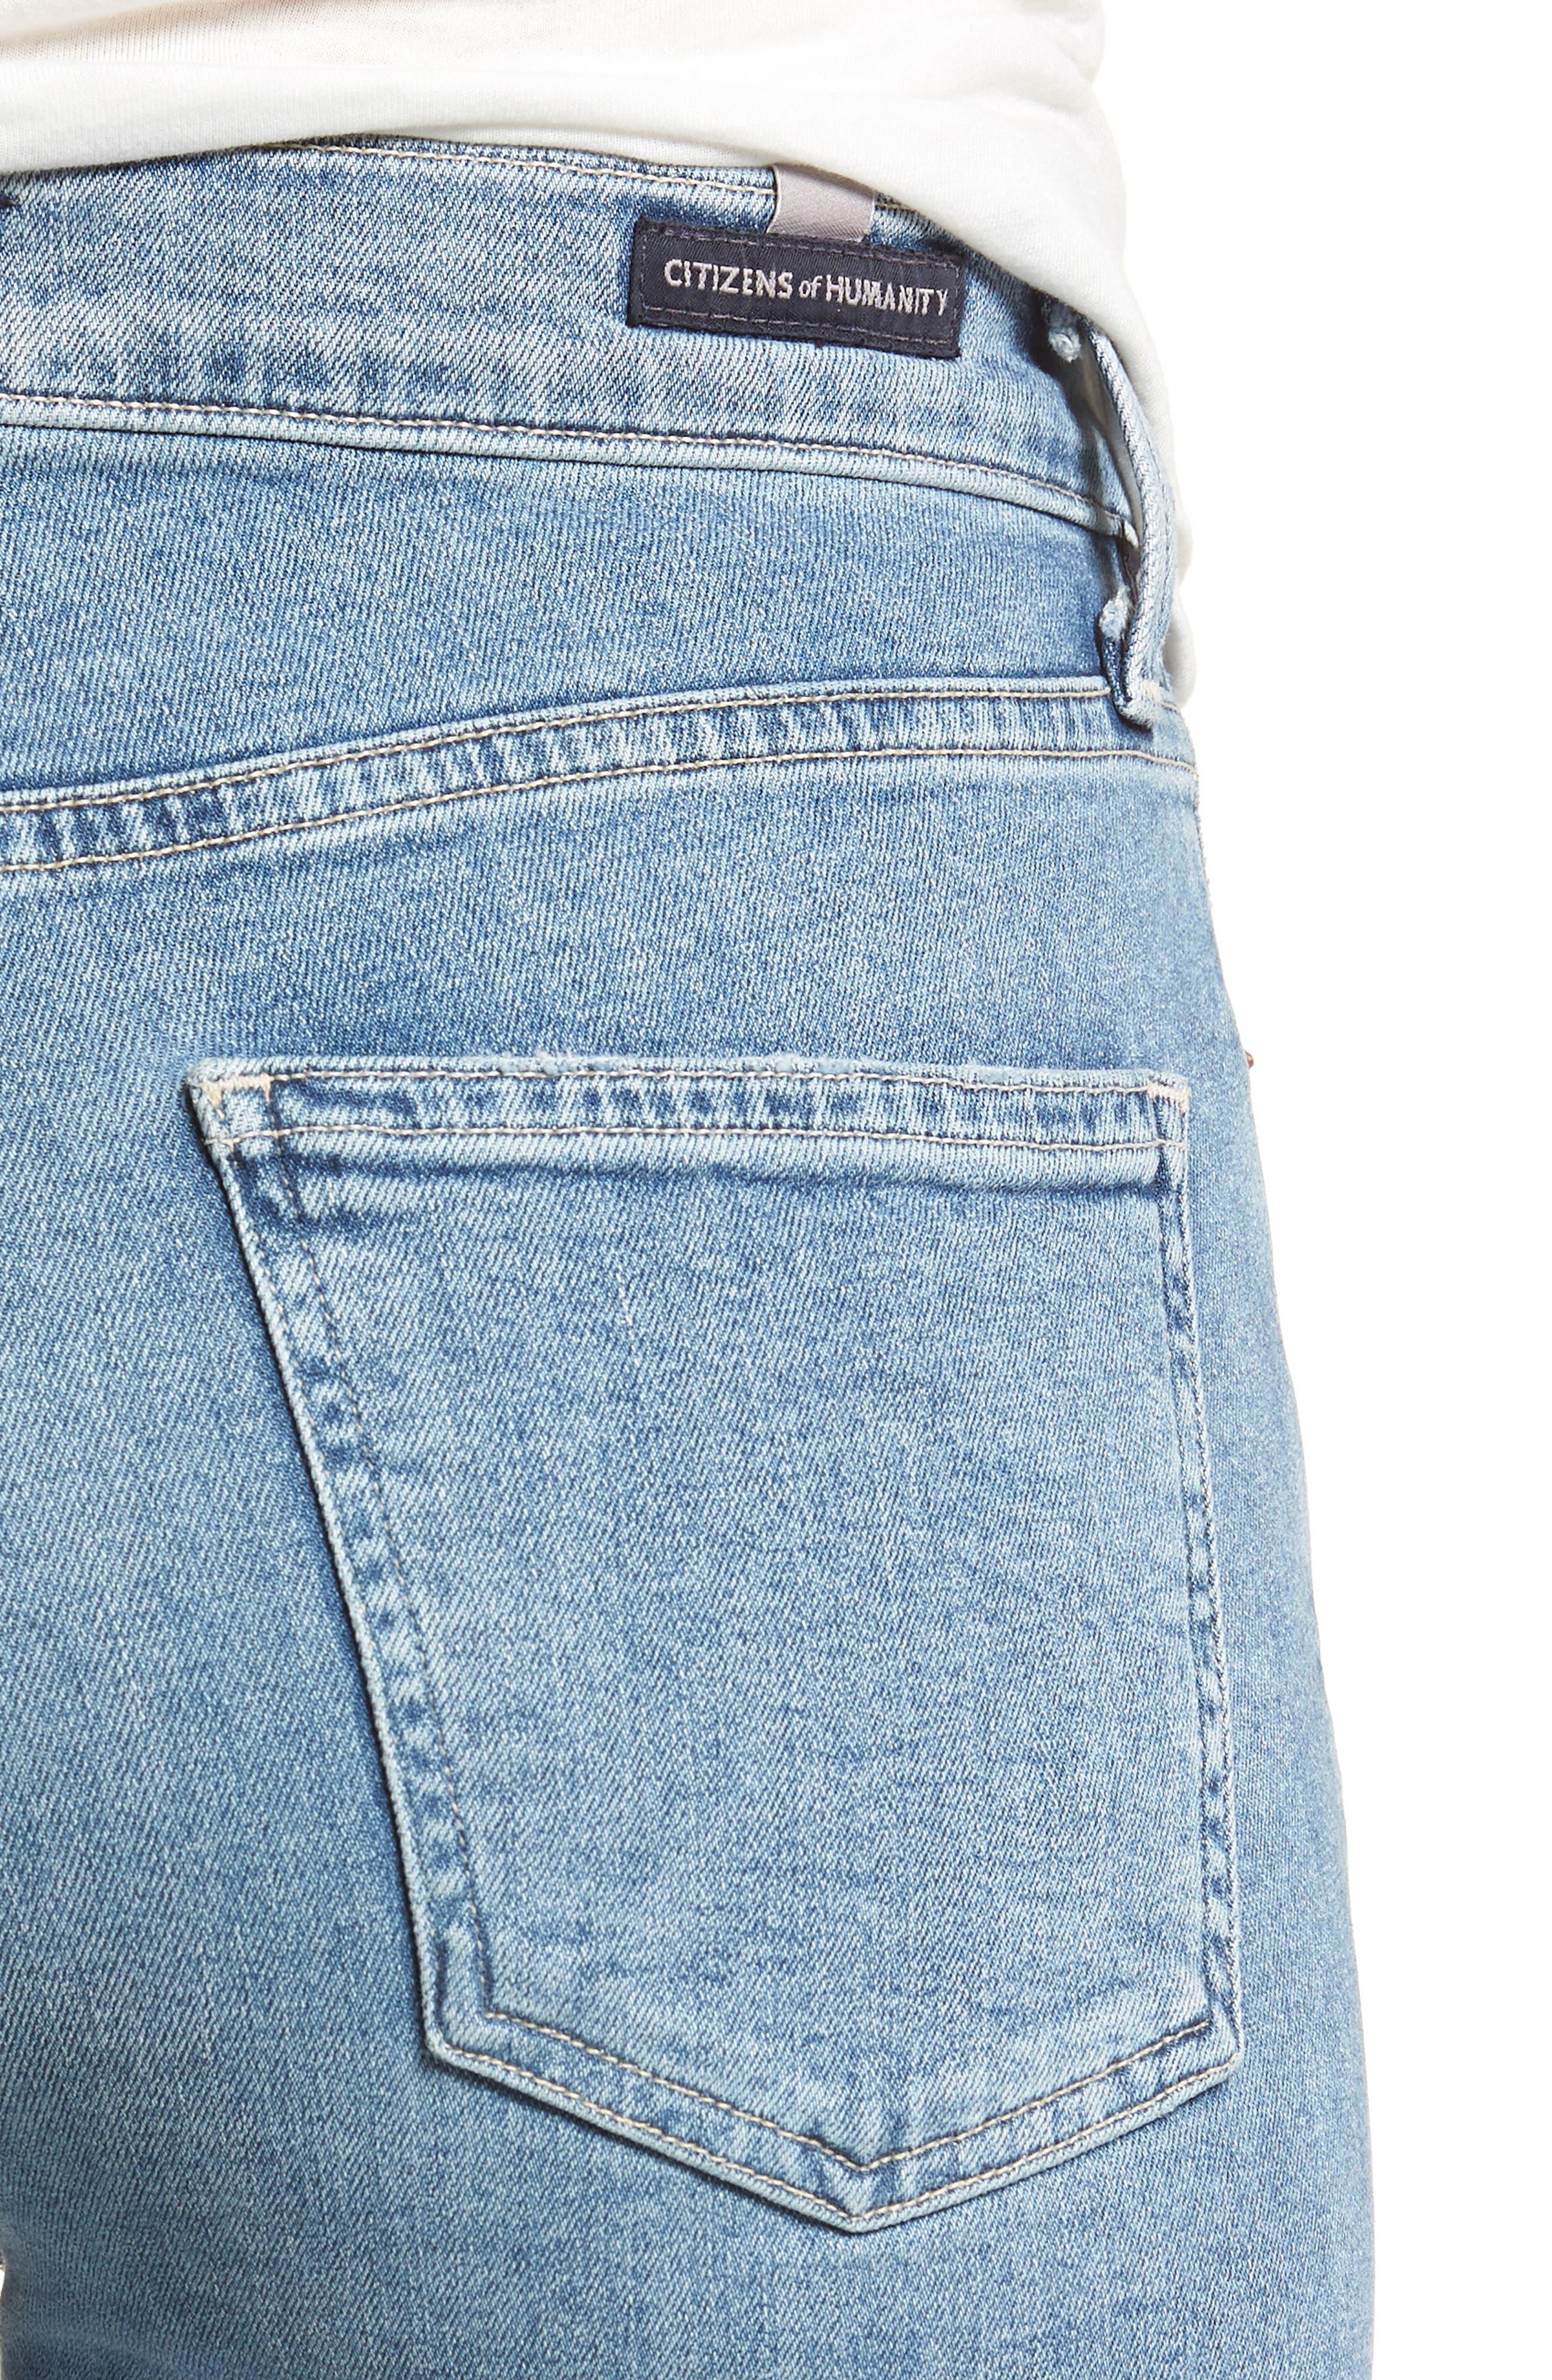 Cara Ankle Cigarette Jeans,                             Alternate thumbnail 4, color,                             Firestone